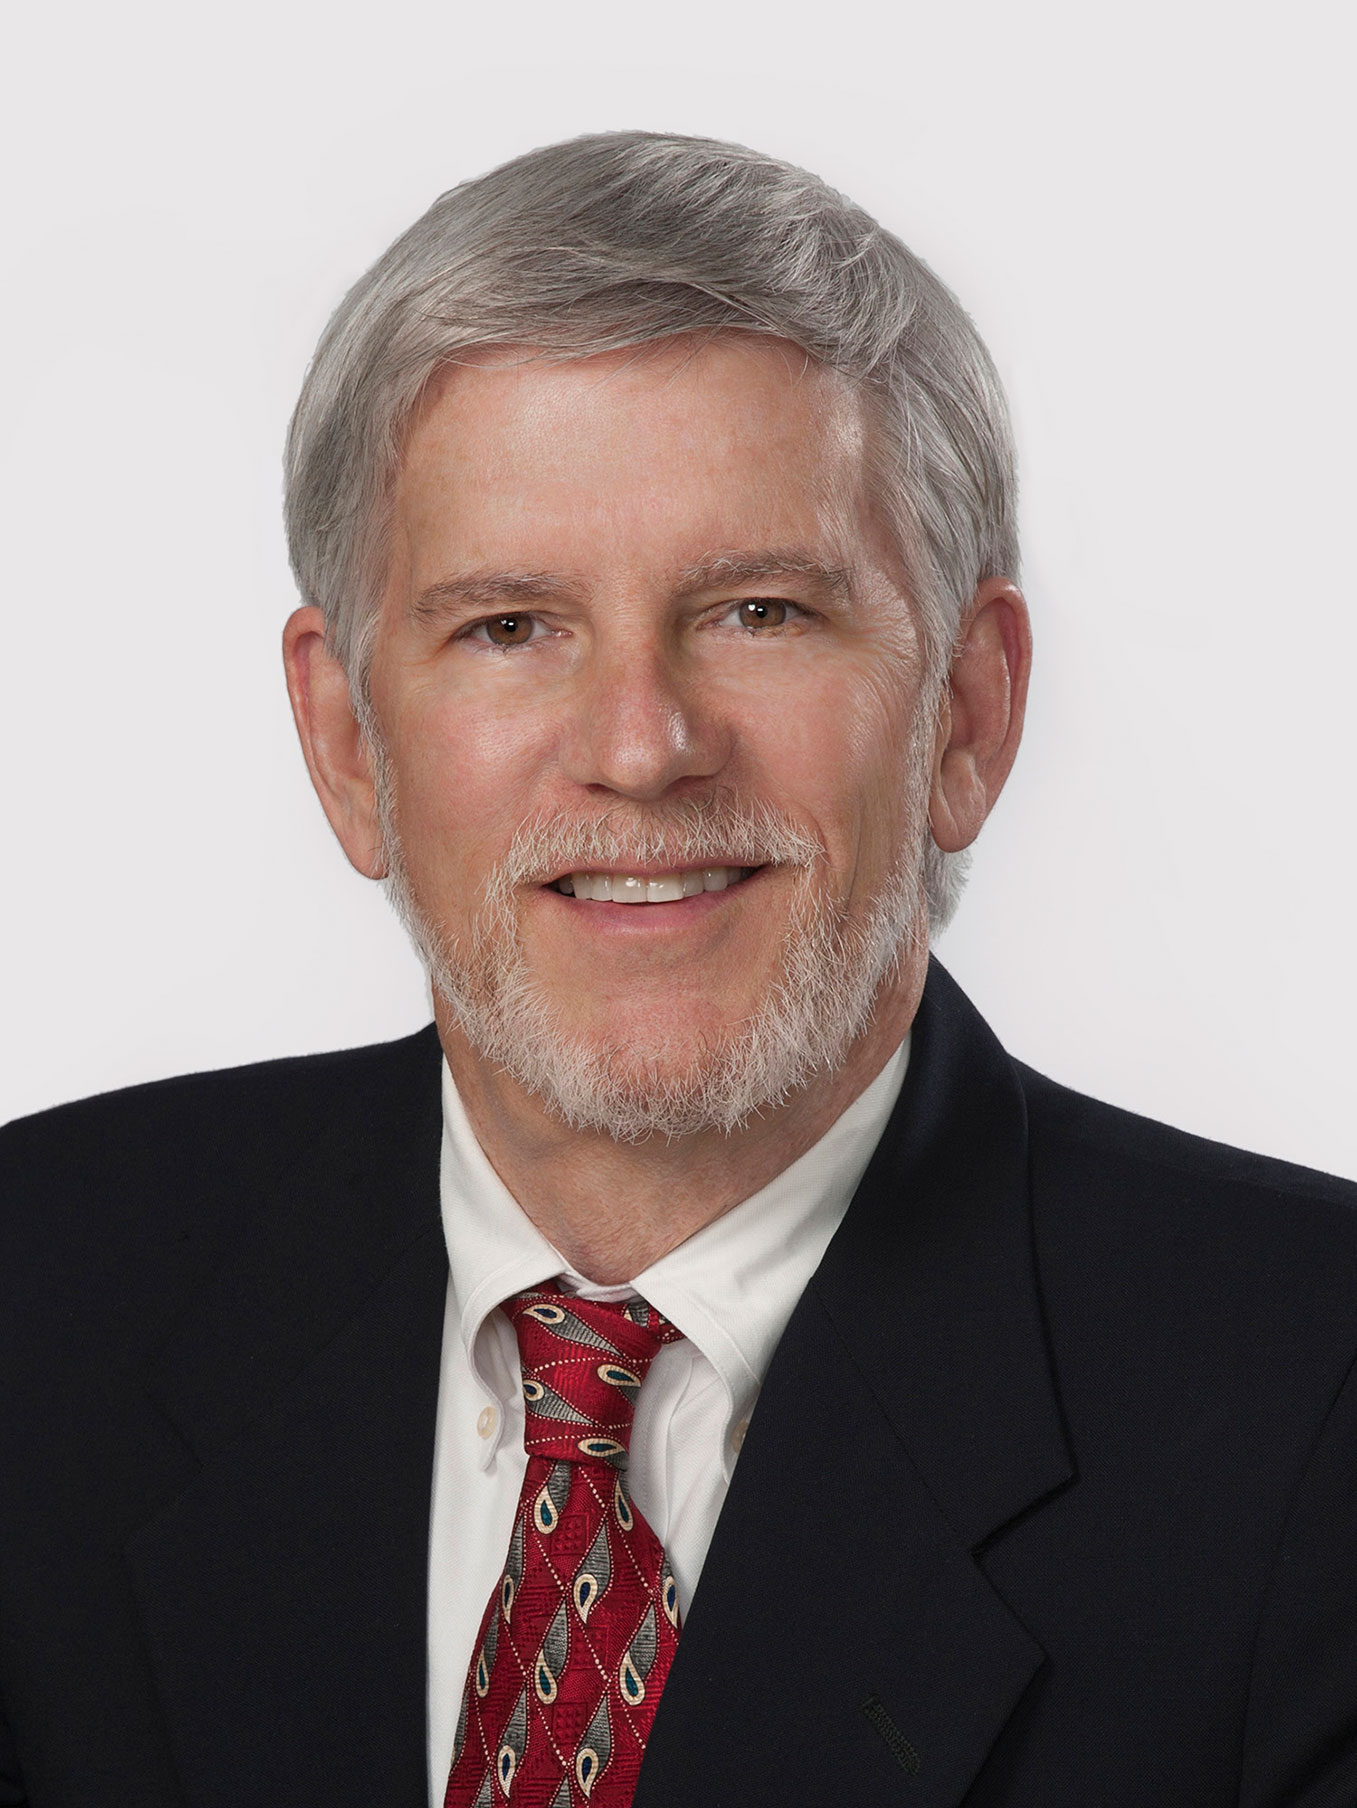 Gordon E. Jones, Senior Vice President of Day Hagan Asset Management in Sarasota, FL.